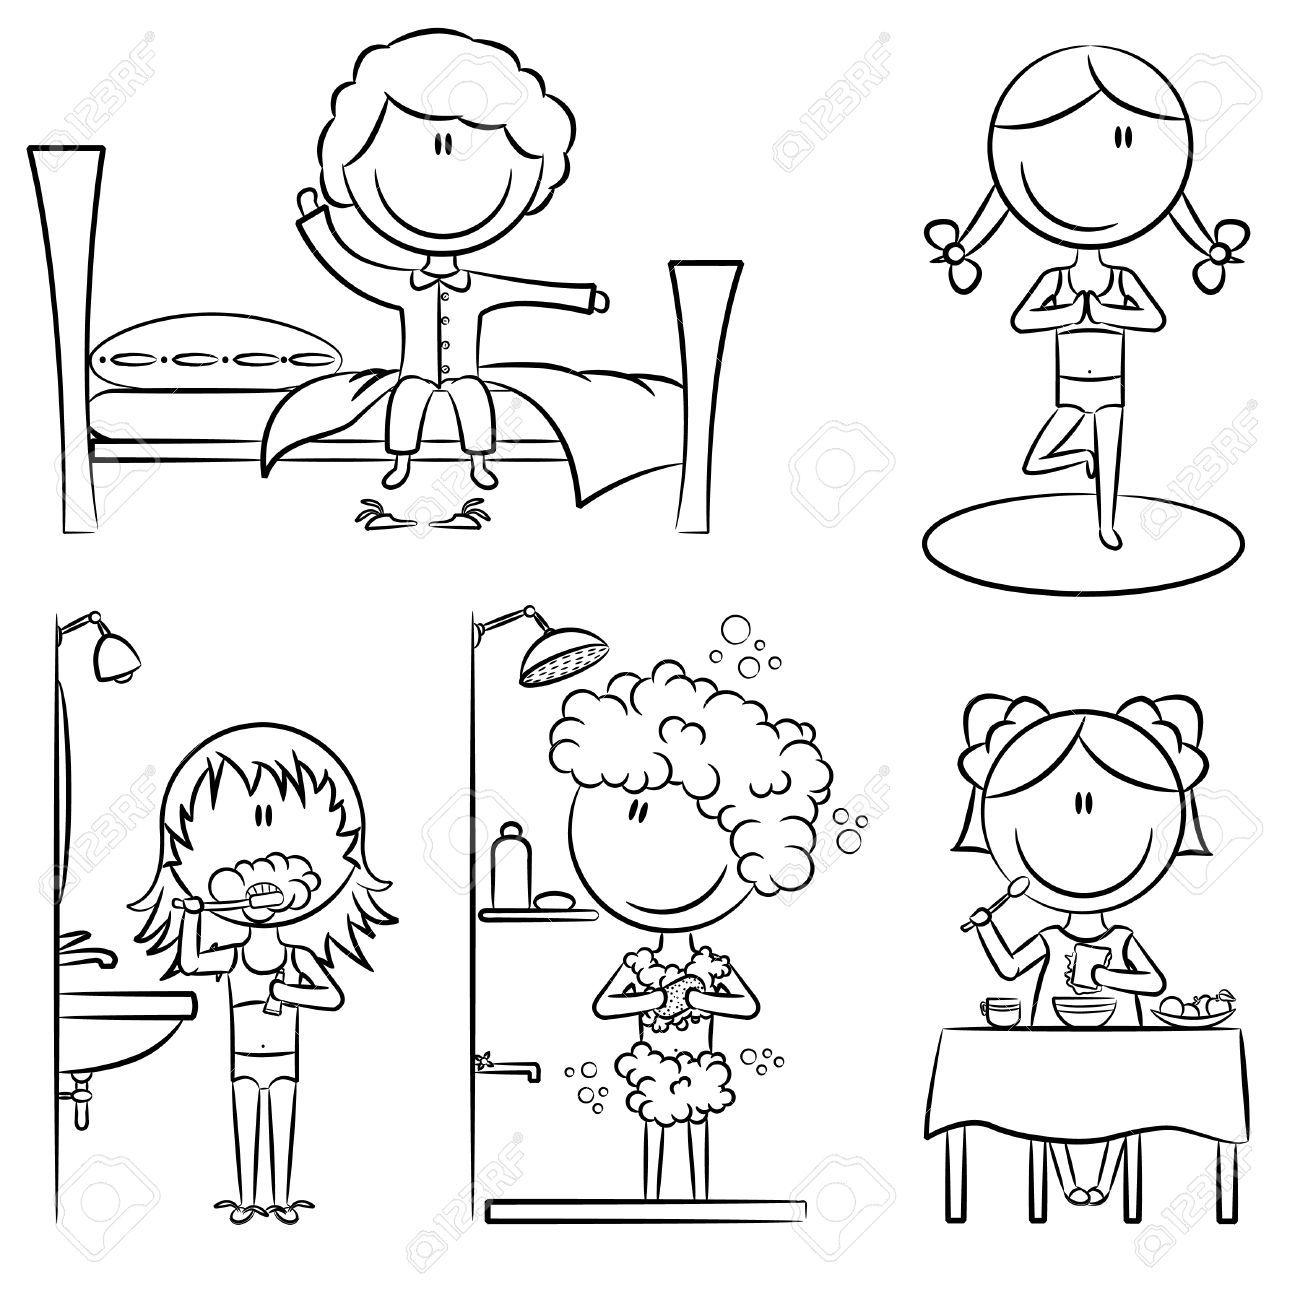 Stock Vector Arte Educacao Infantil Desenhos Arte Educacao